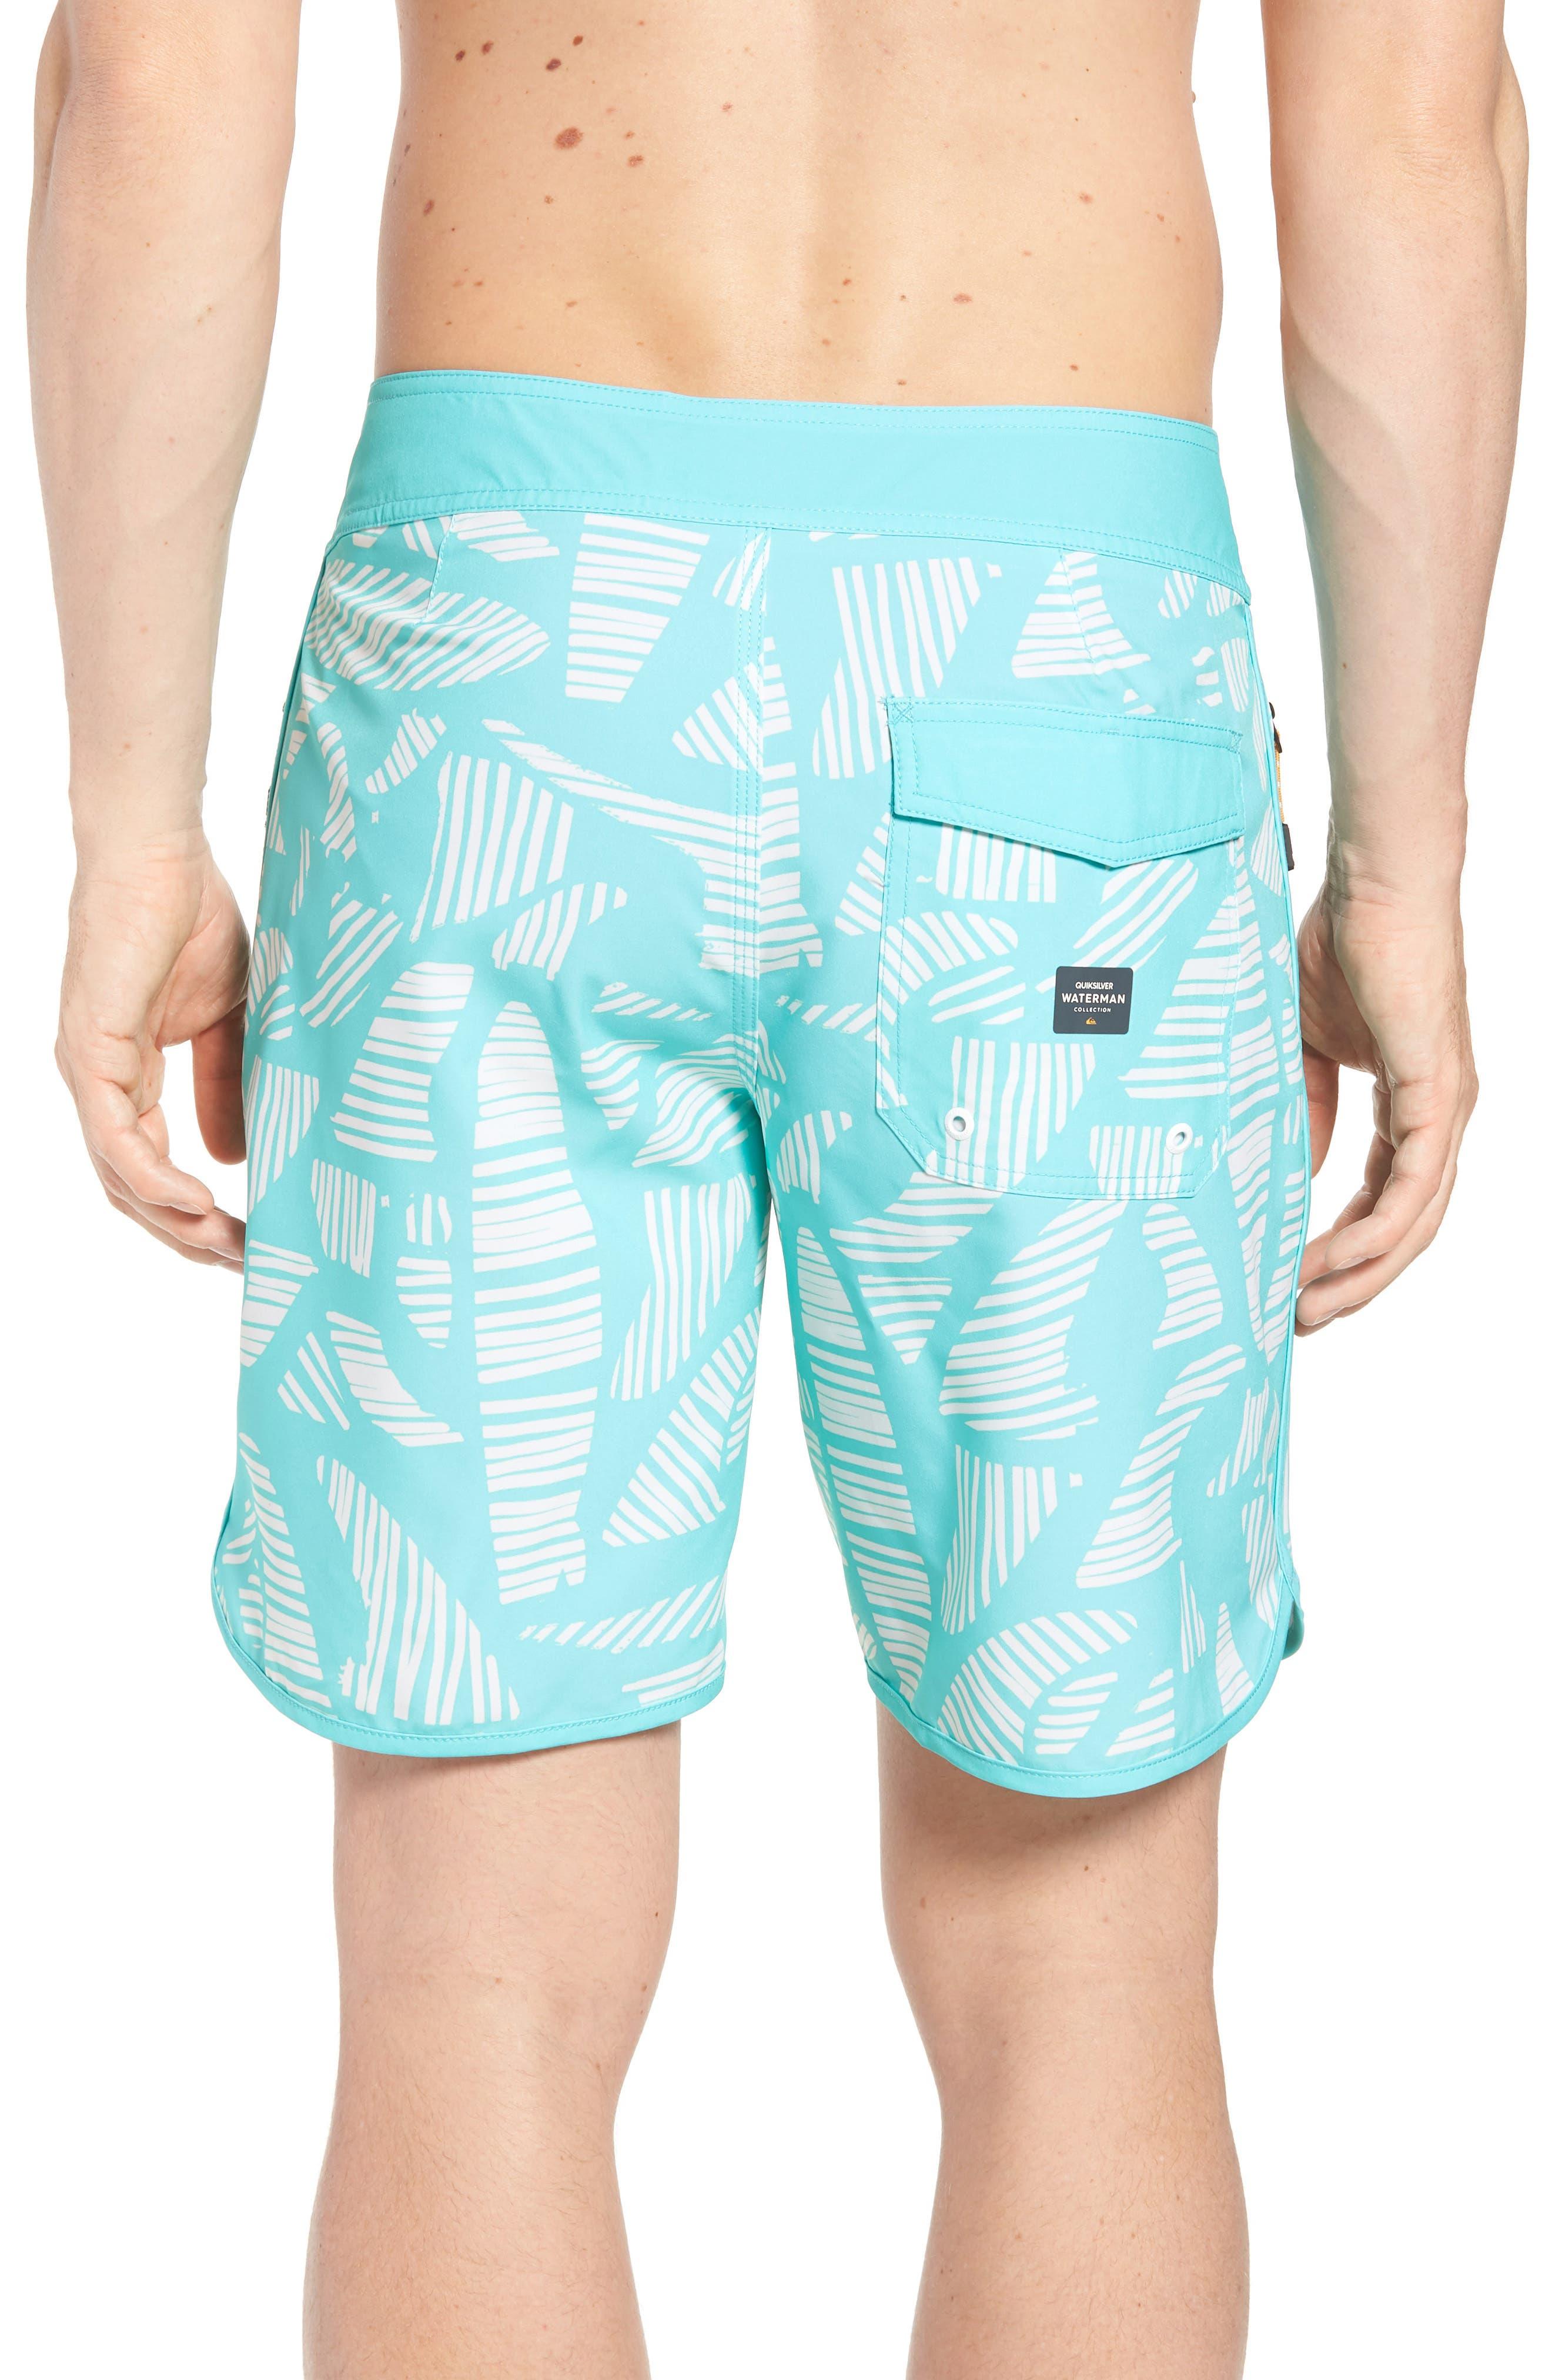 Odysea Board Shorts,                             Alternate thumbnail 2, color,                             BLUE RADIANCE